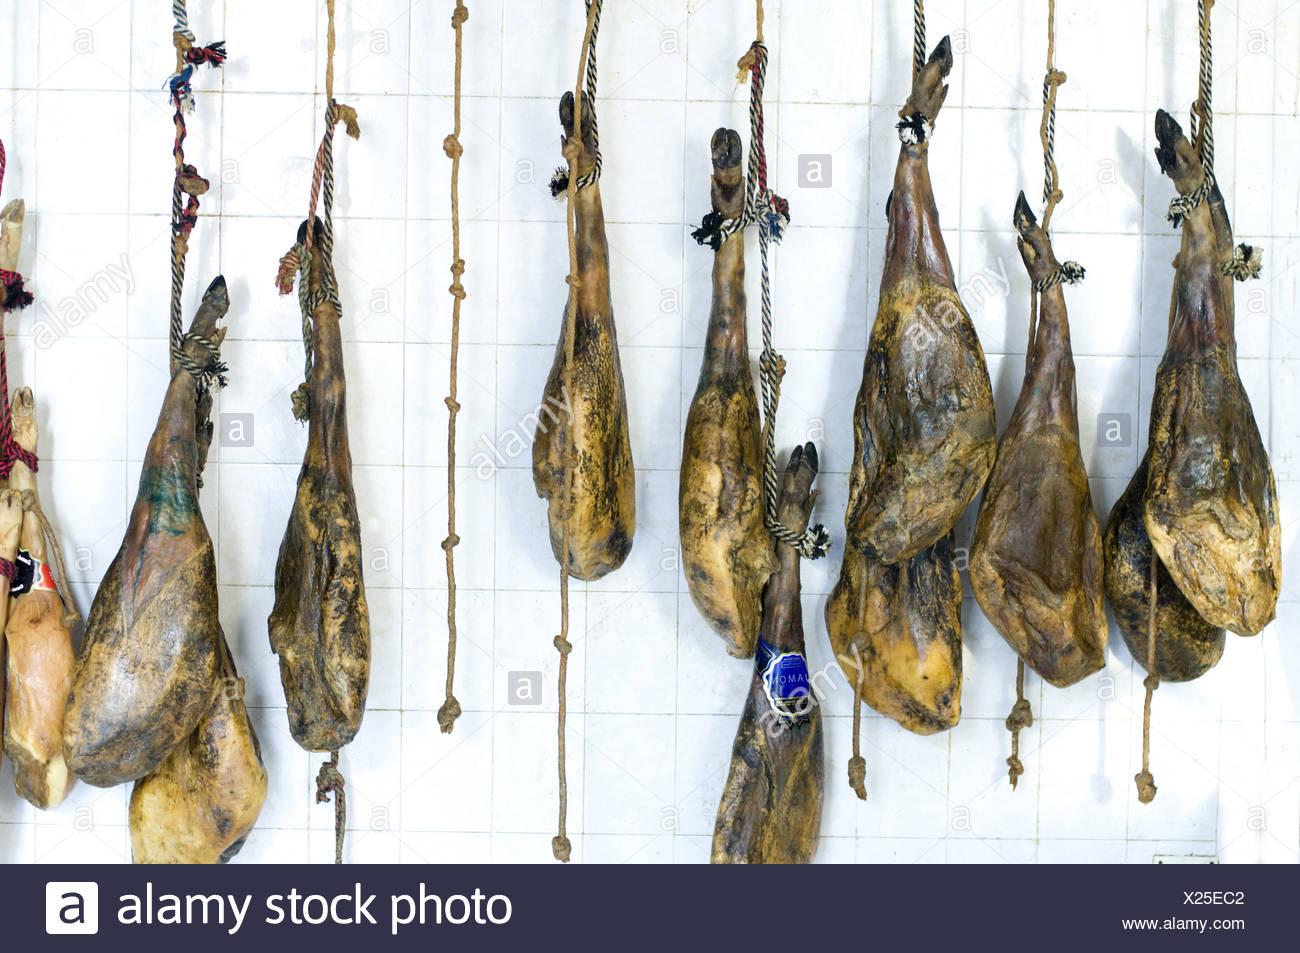 ham - Stock Image